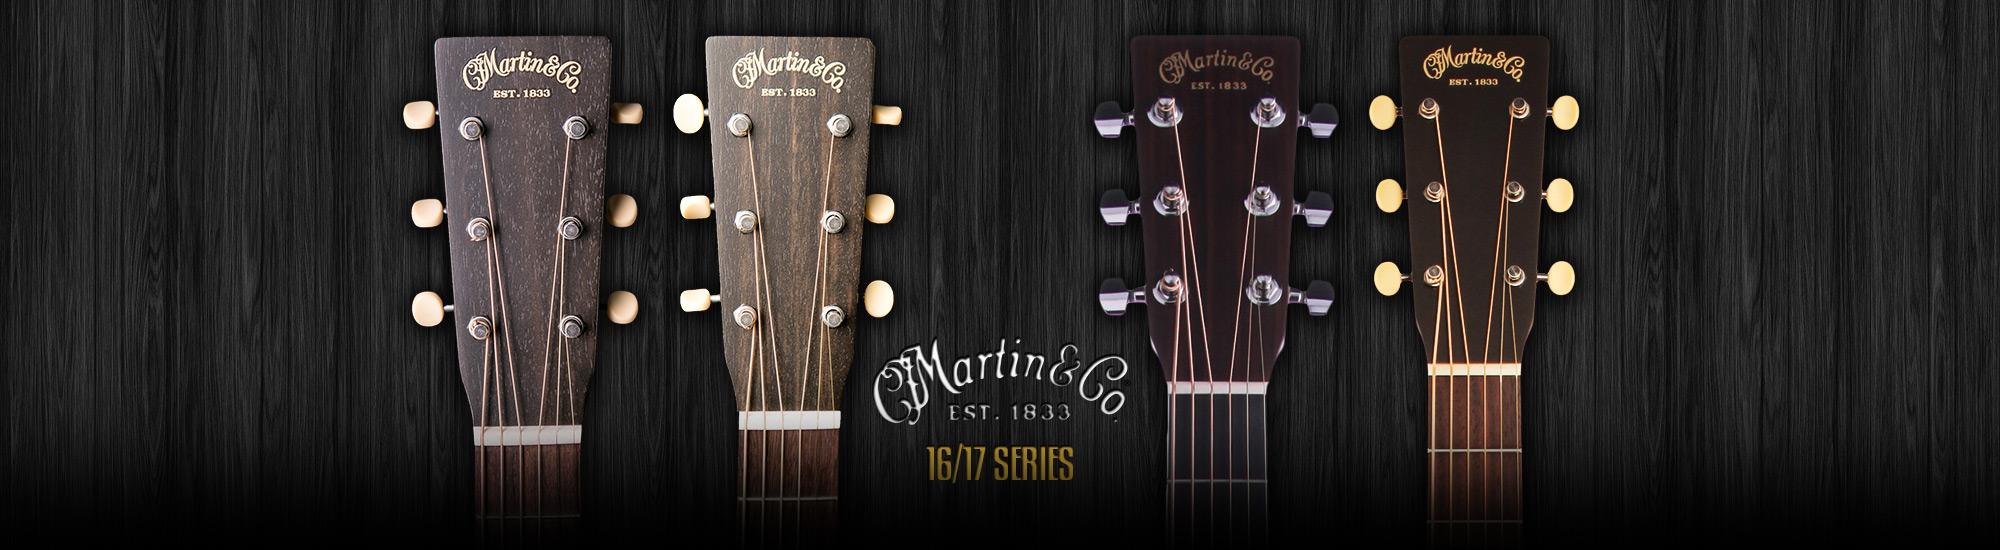 Martin 16/17 Series